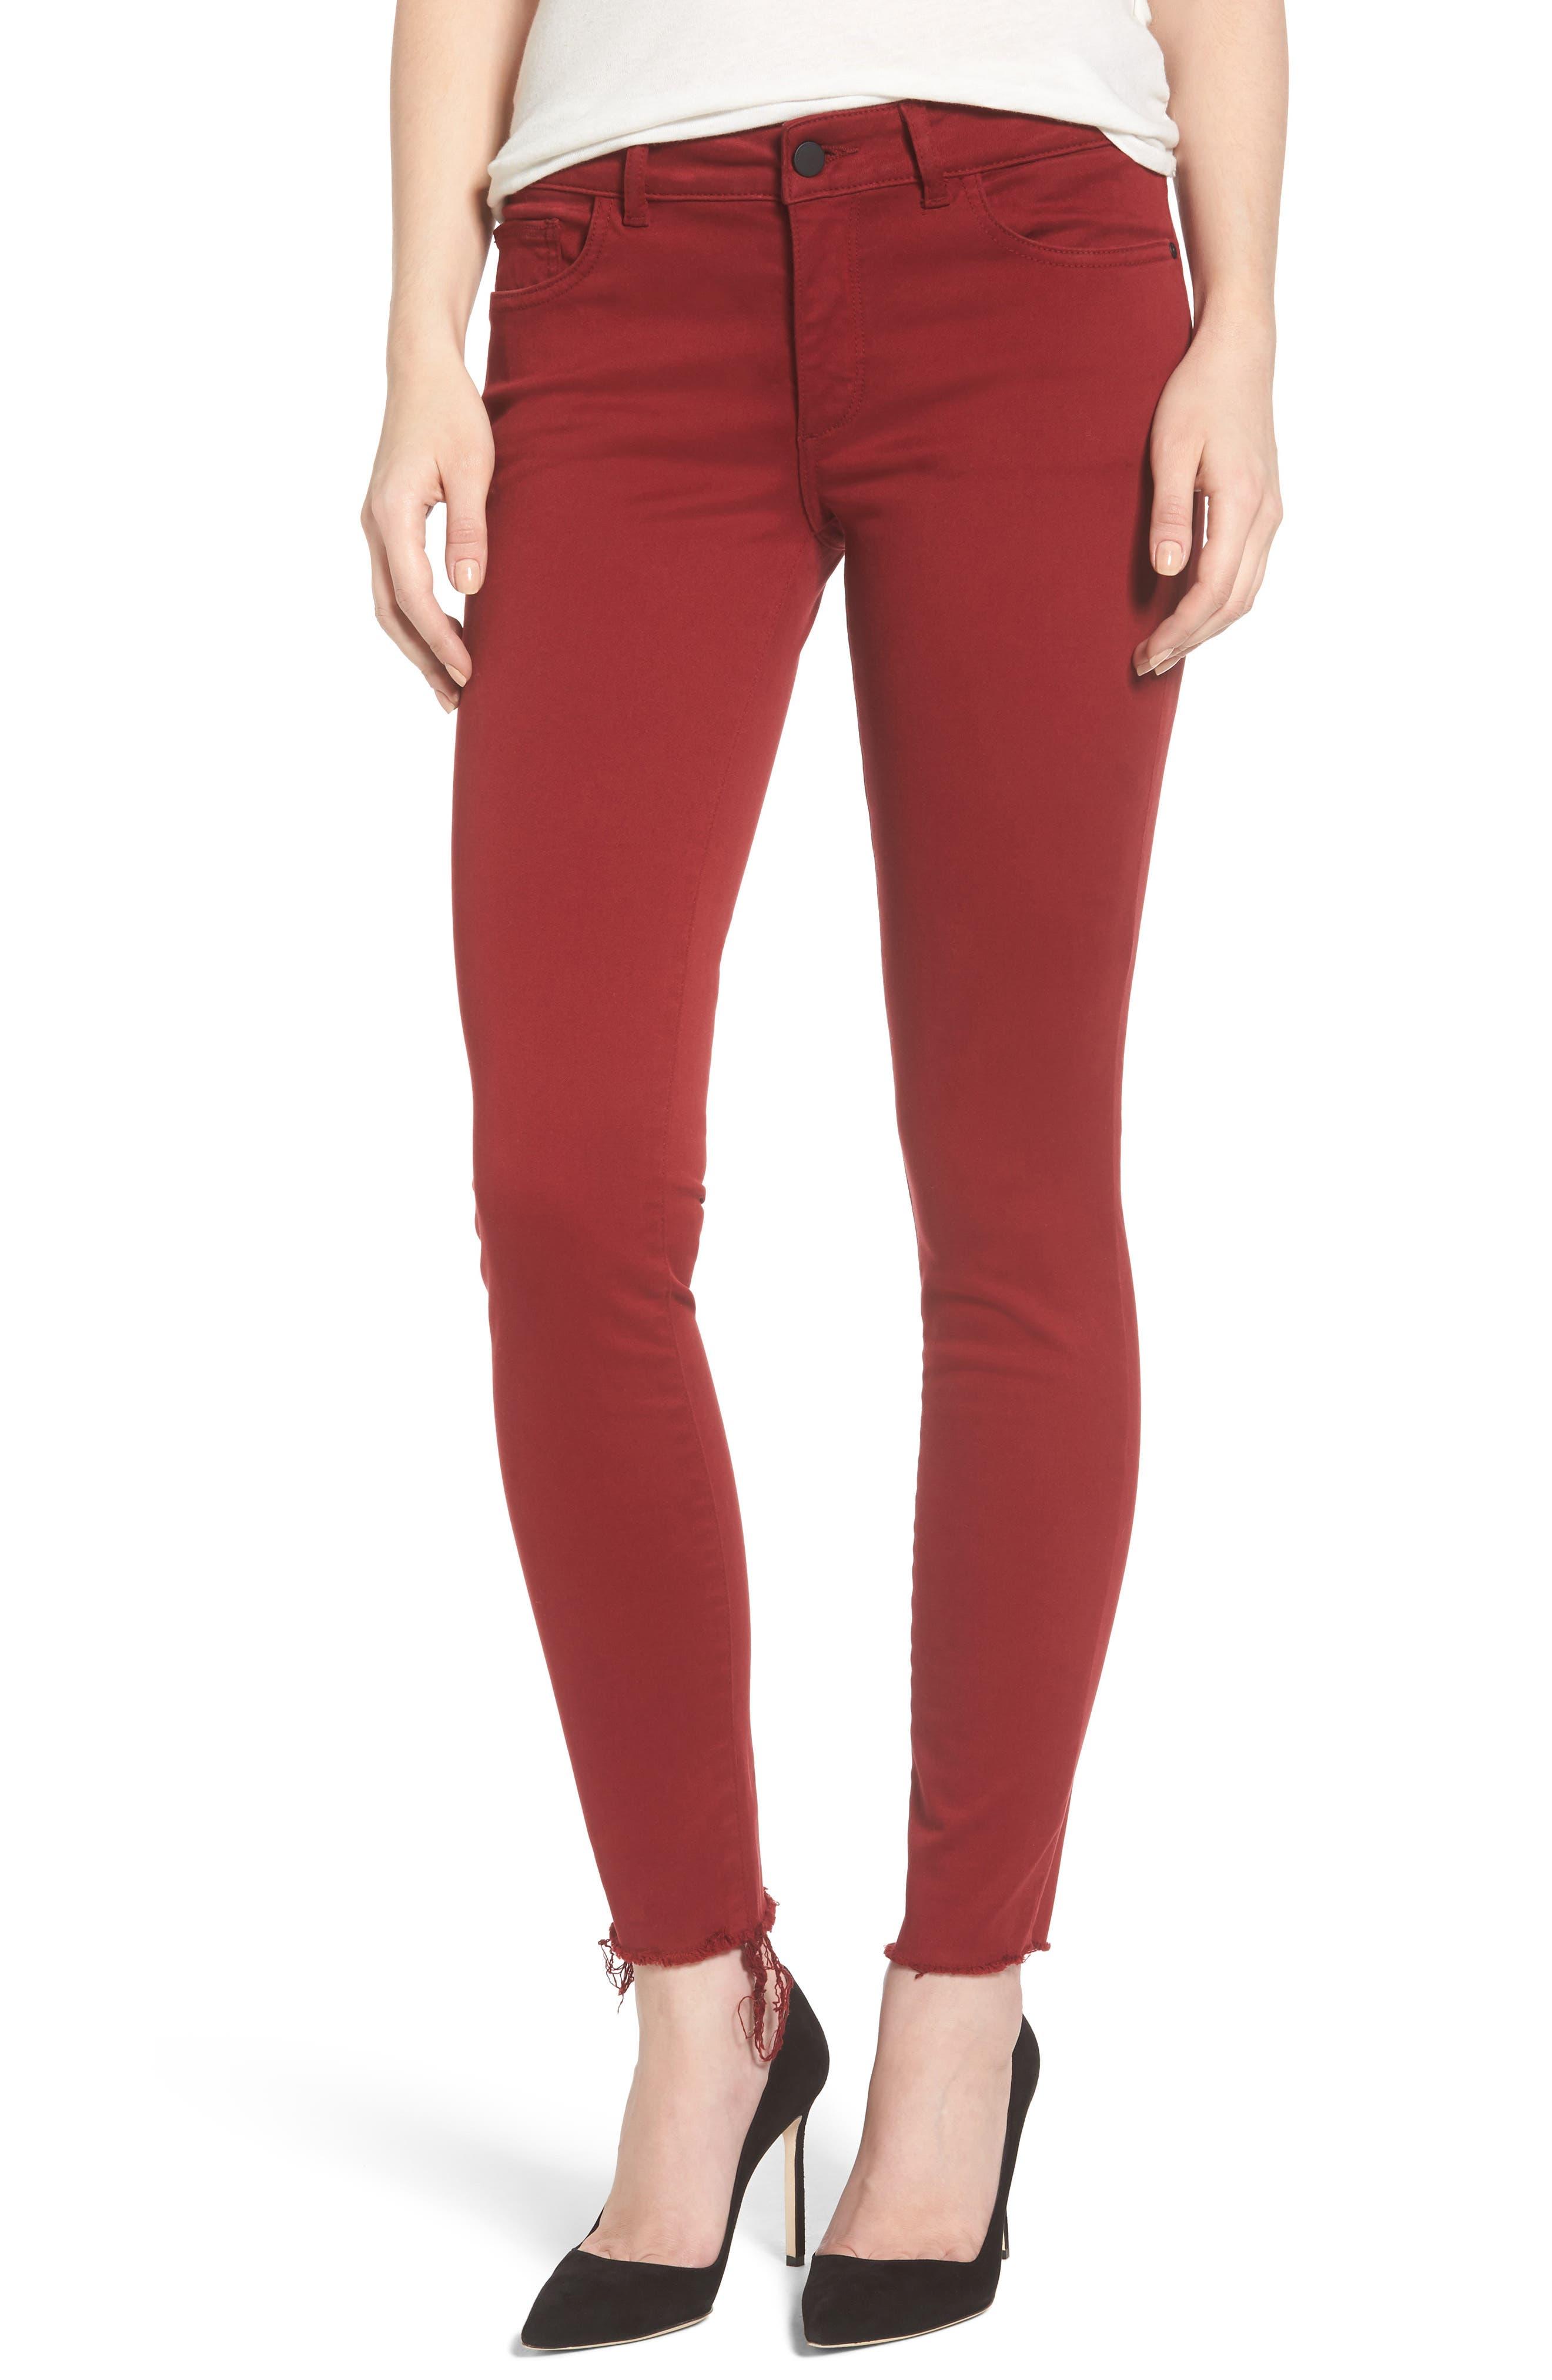 Main Image - DL1961 Emma Power Legging Jeans (Rhubarb)